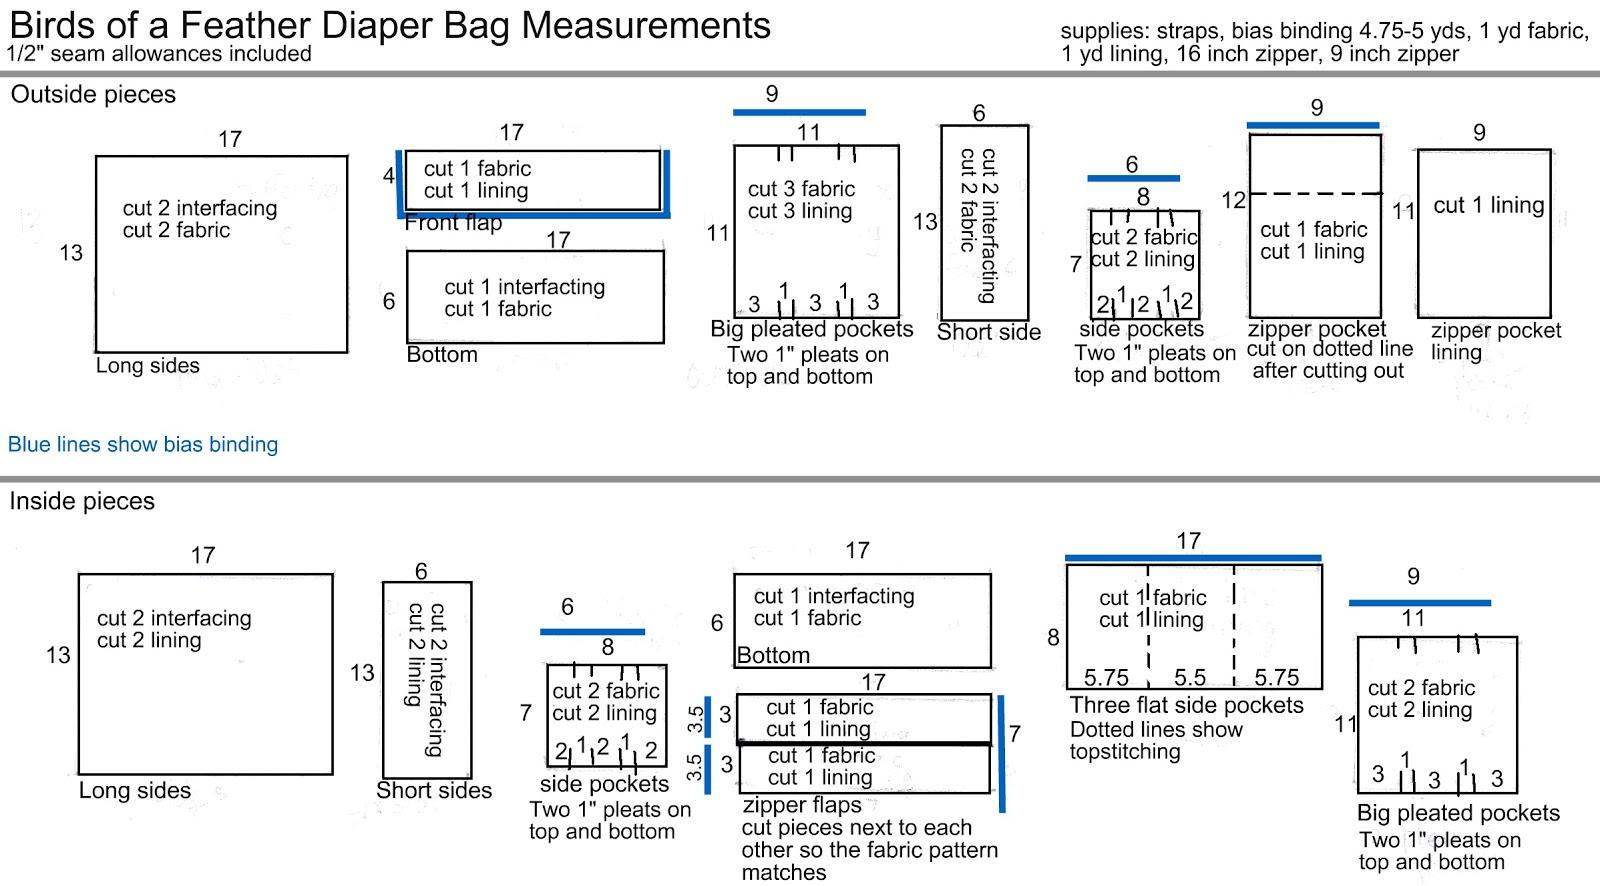 Birds Of A Feather Diaper Bag Measurements Heather Handmade